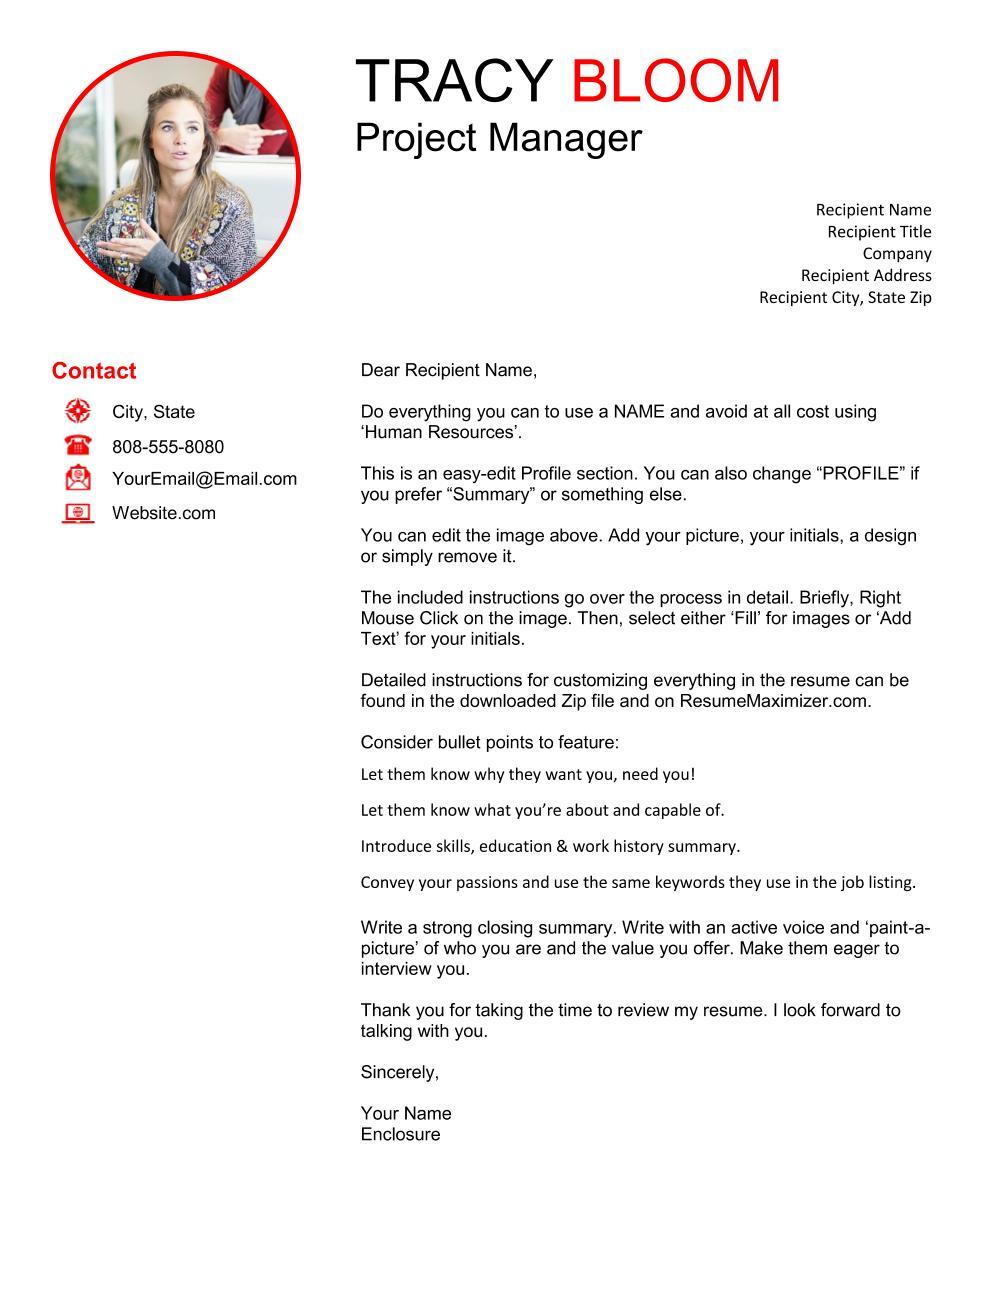 Revealed Pro - Cover Letter